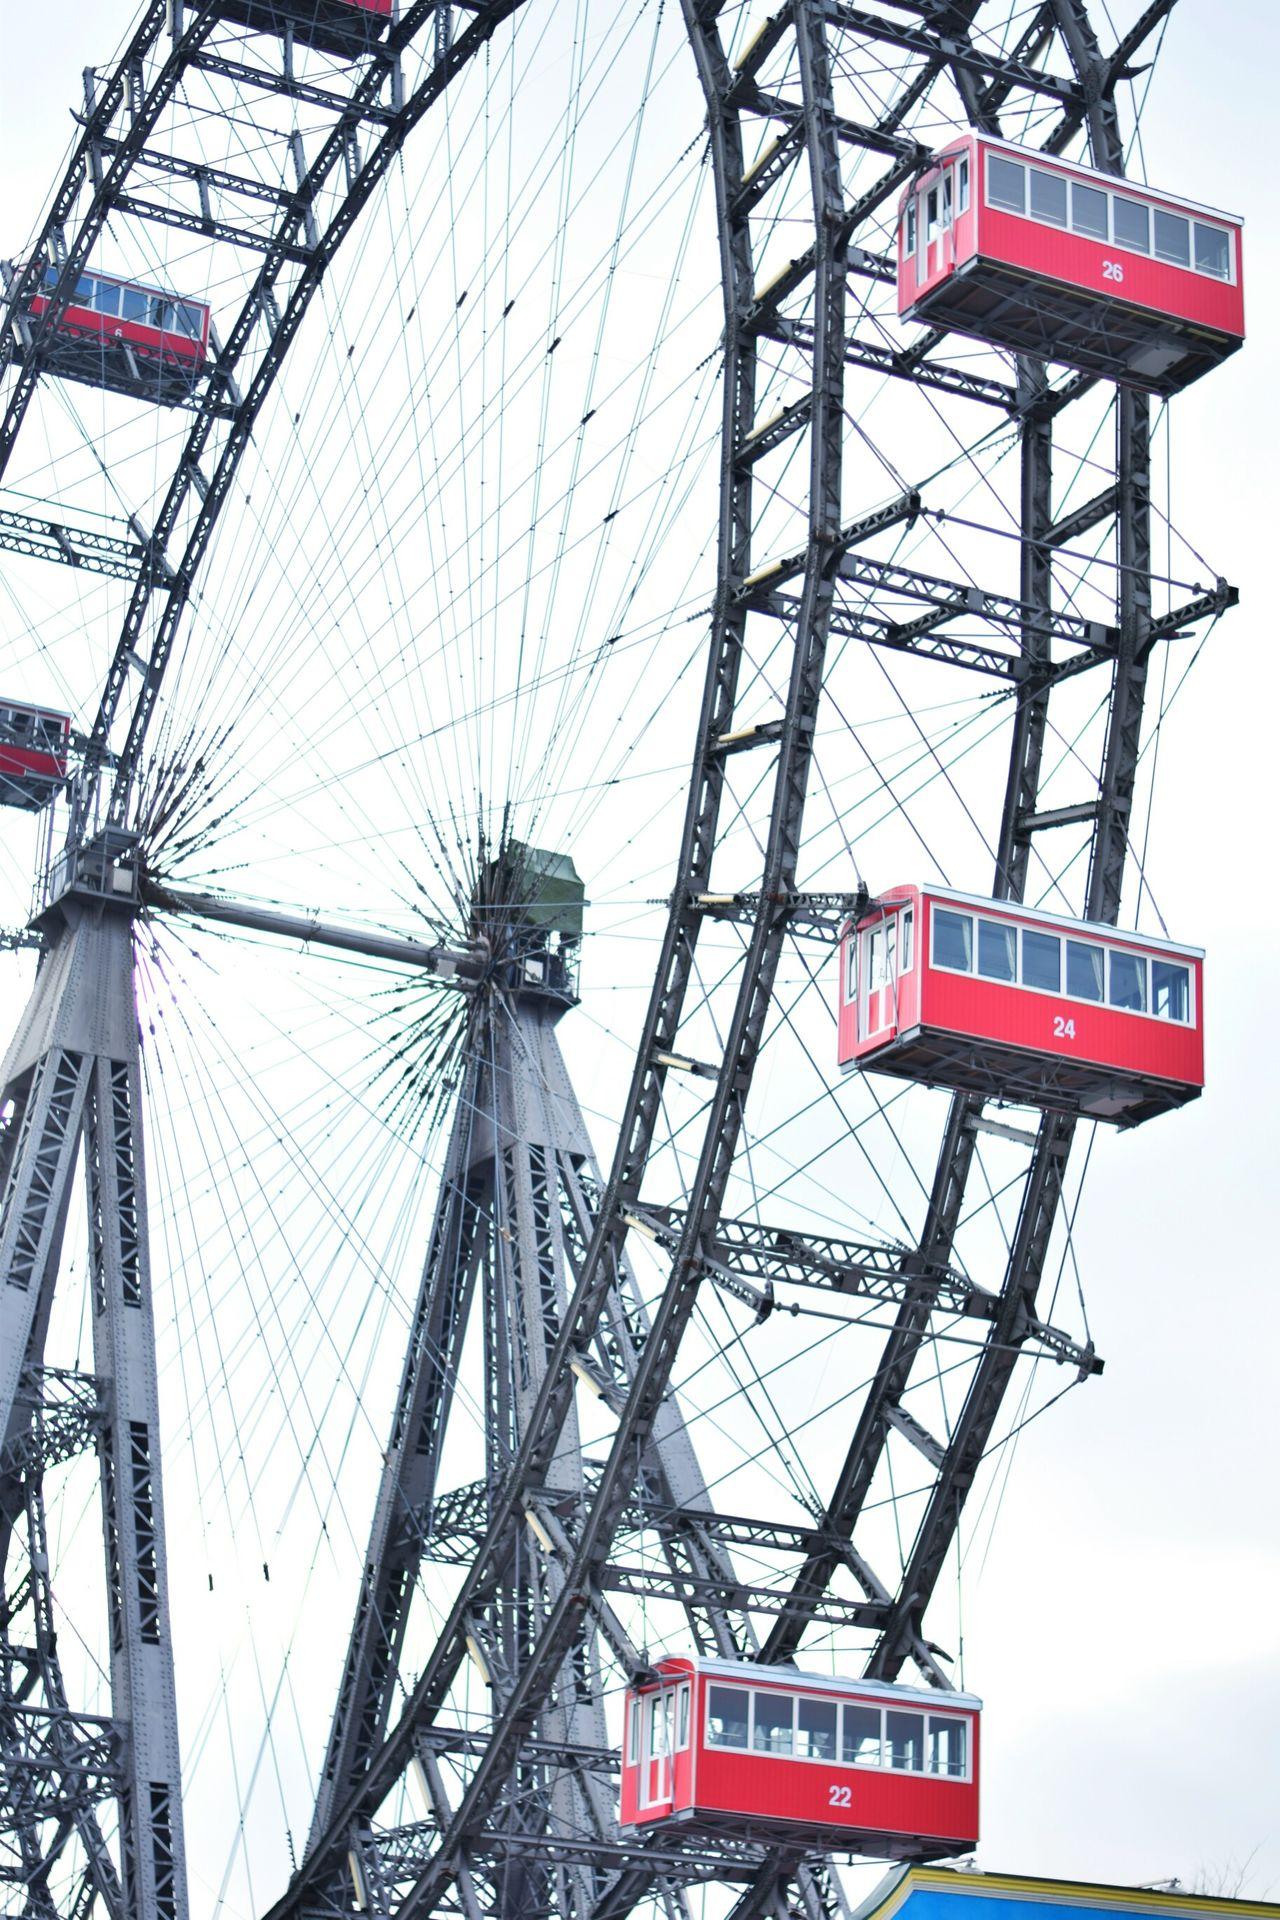 Amusement Park Ride Day Sky No People Atractions Riesenrad RAD Arts Culture And Entertainment Amusement Park City